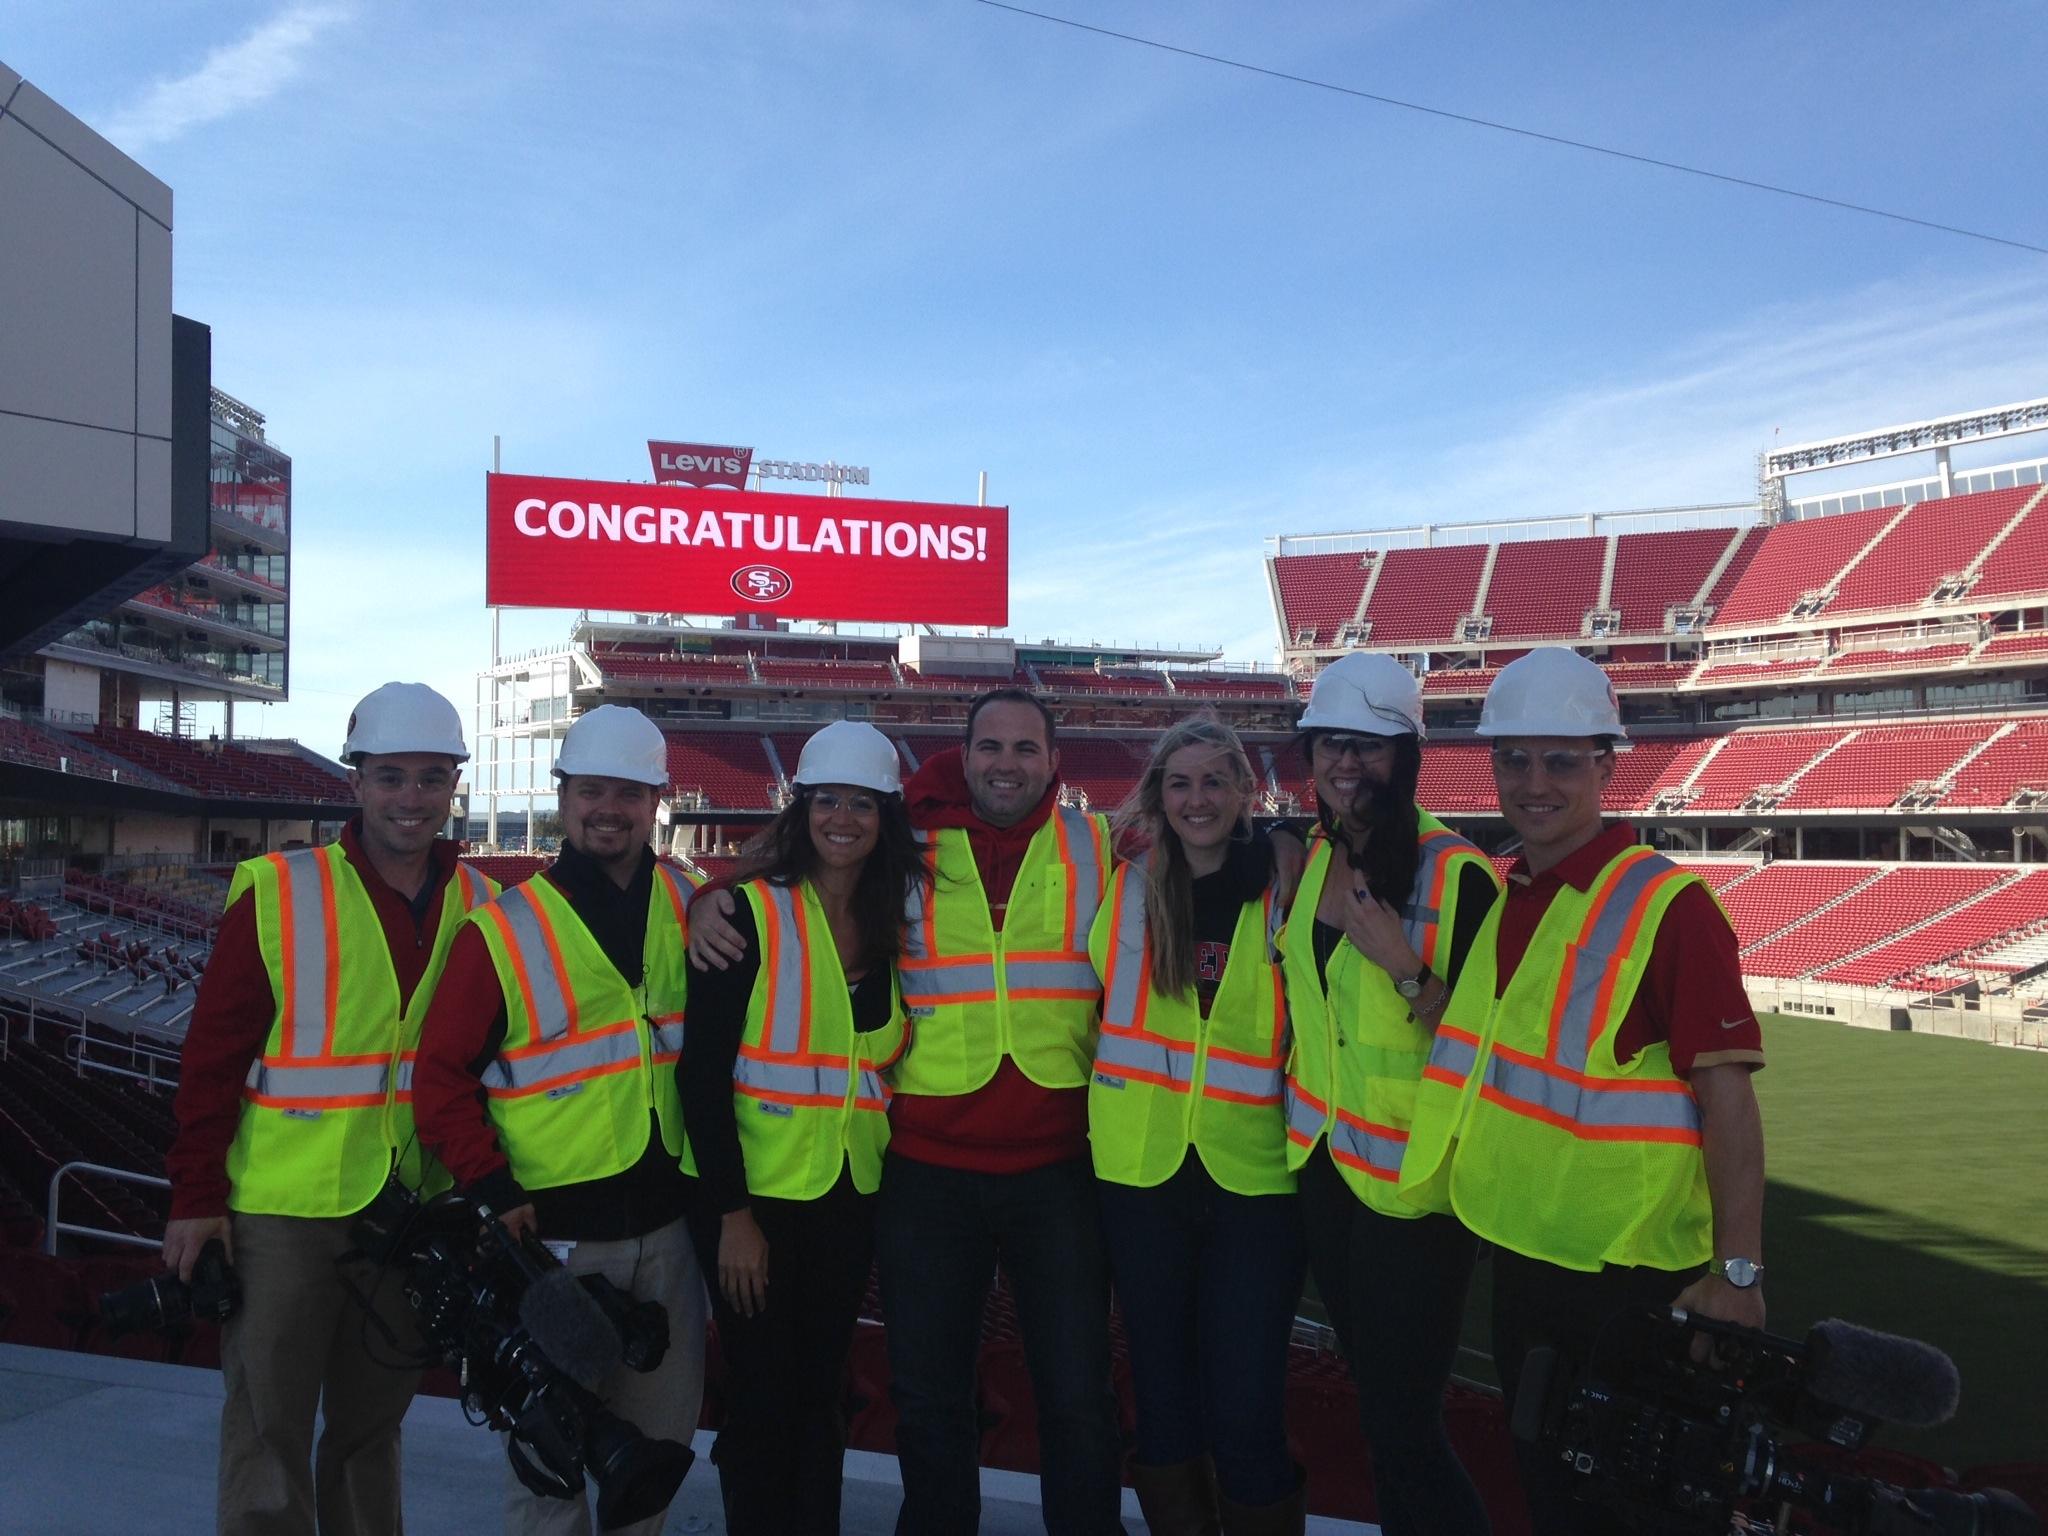 Image 8 of Scott & Sarah: 49ers Fan Proposes in New Stadium